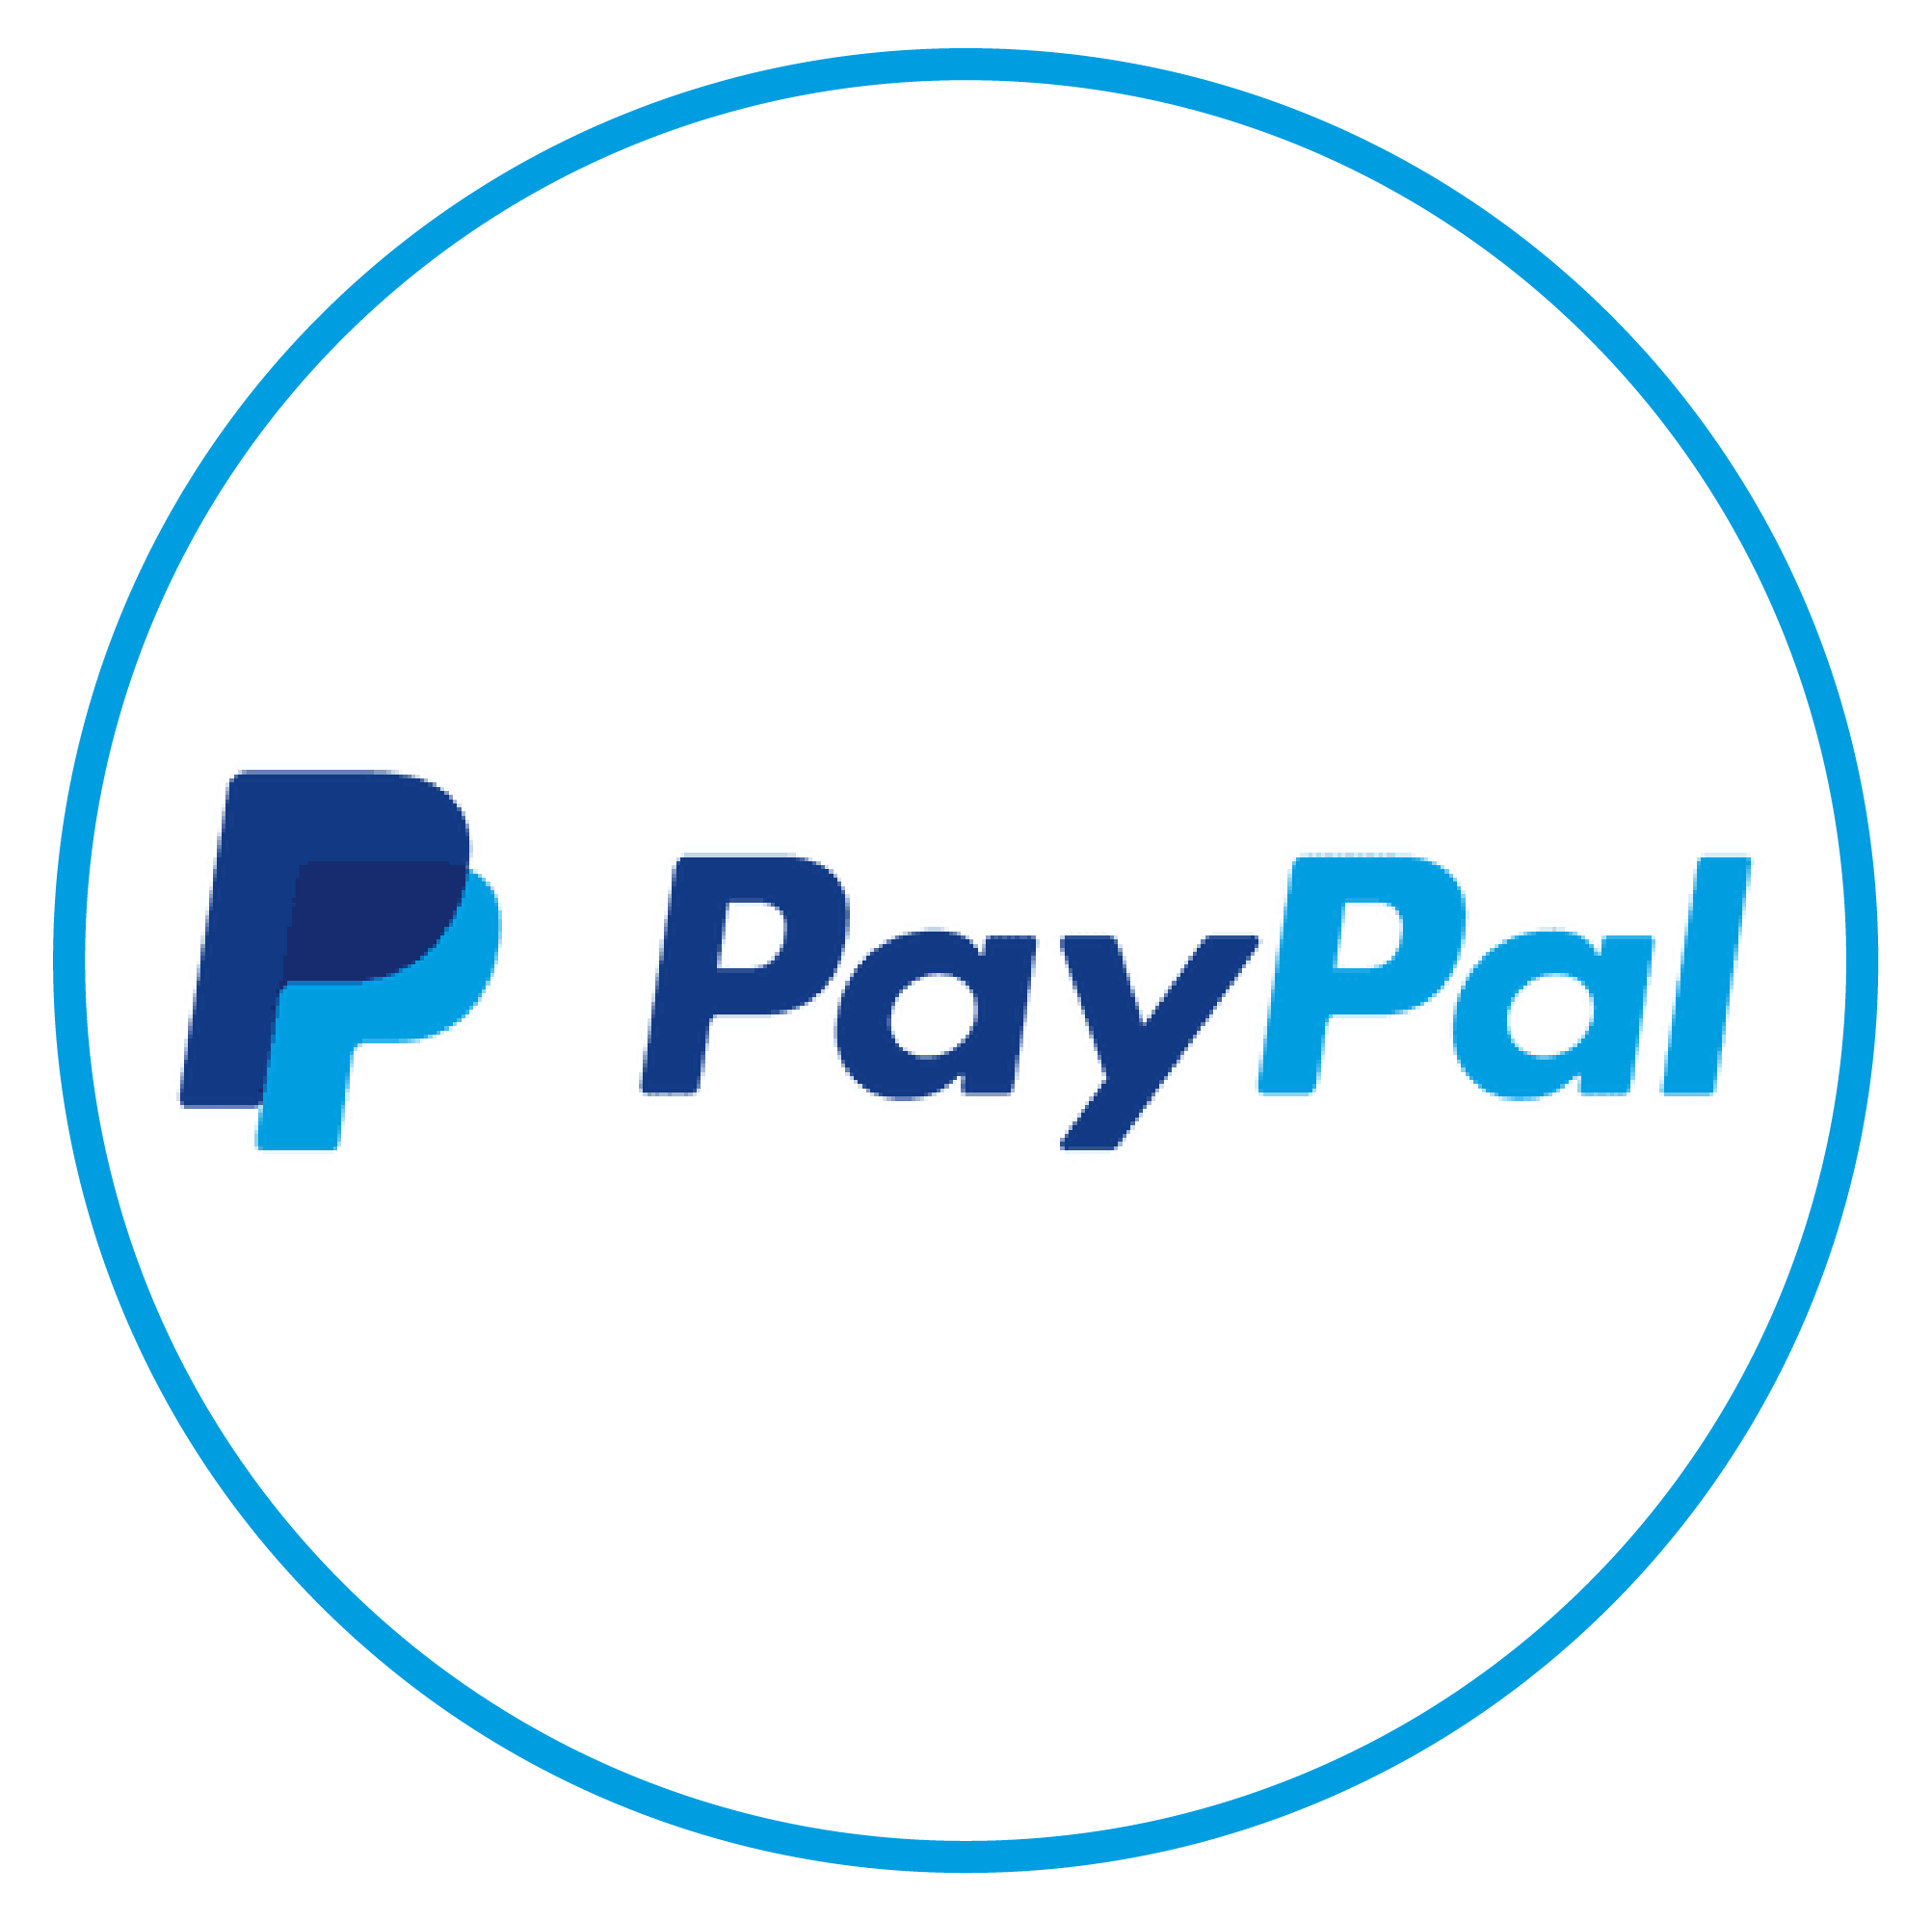 logo-paypal-01